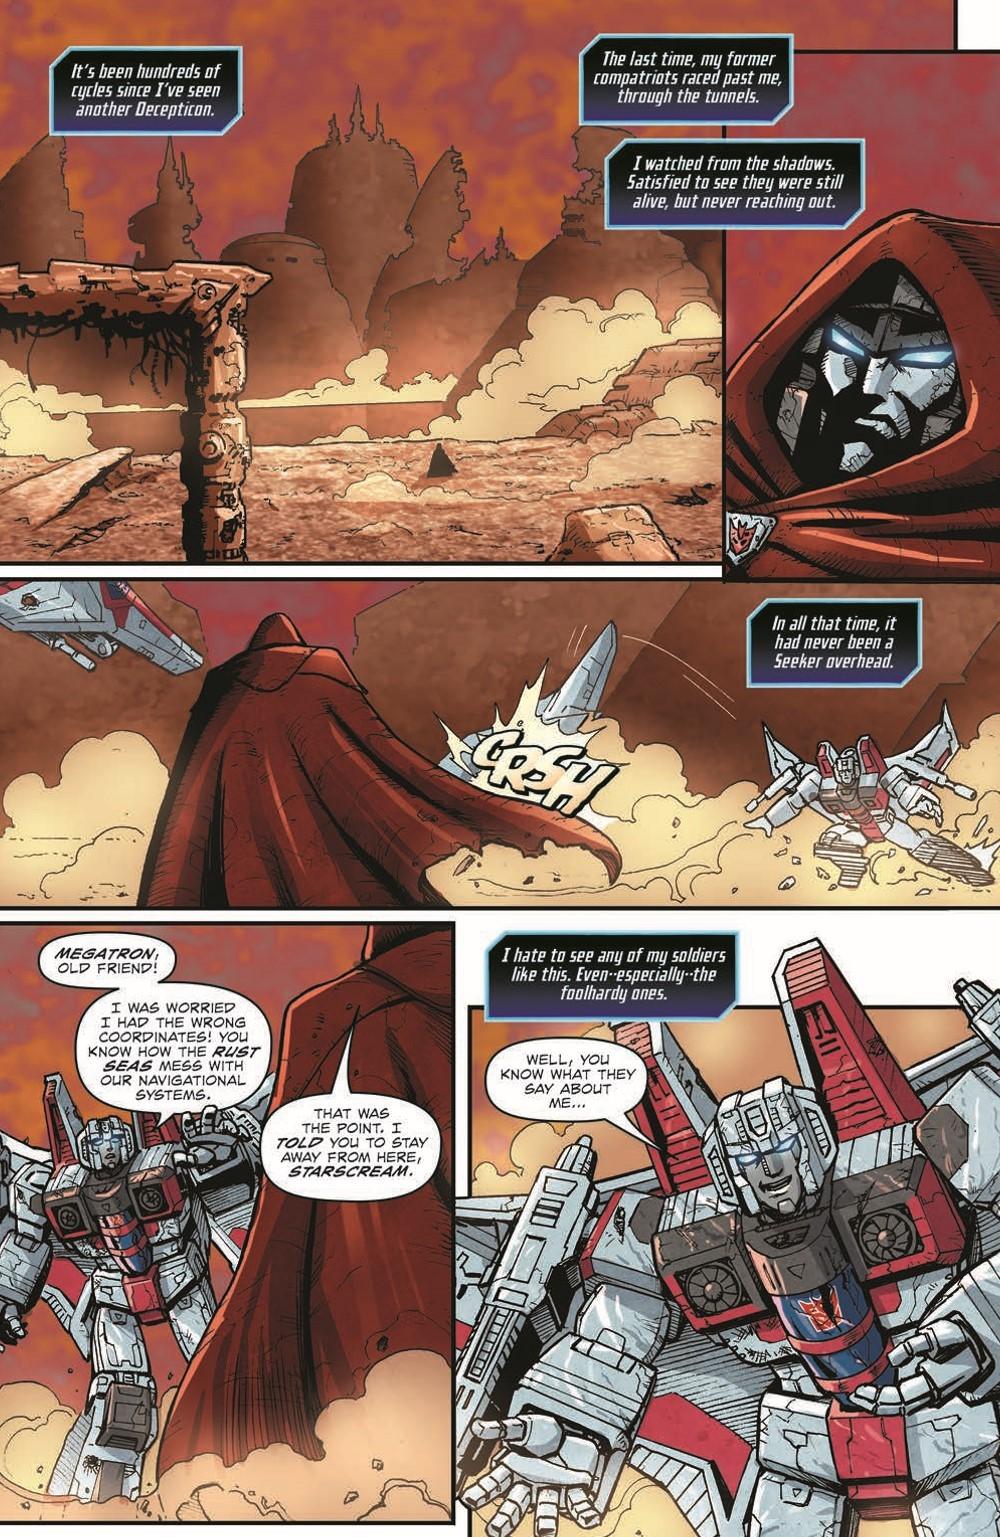 TF_ShatGlass02-pr-3 ComicList Previews: TRANSFORMERS SHATTERED GLASS #2 (OF 5)